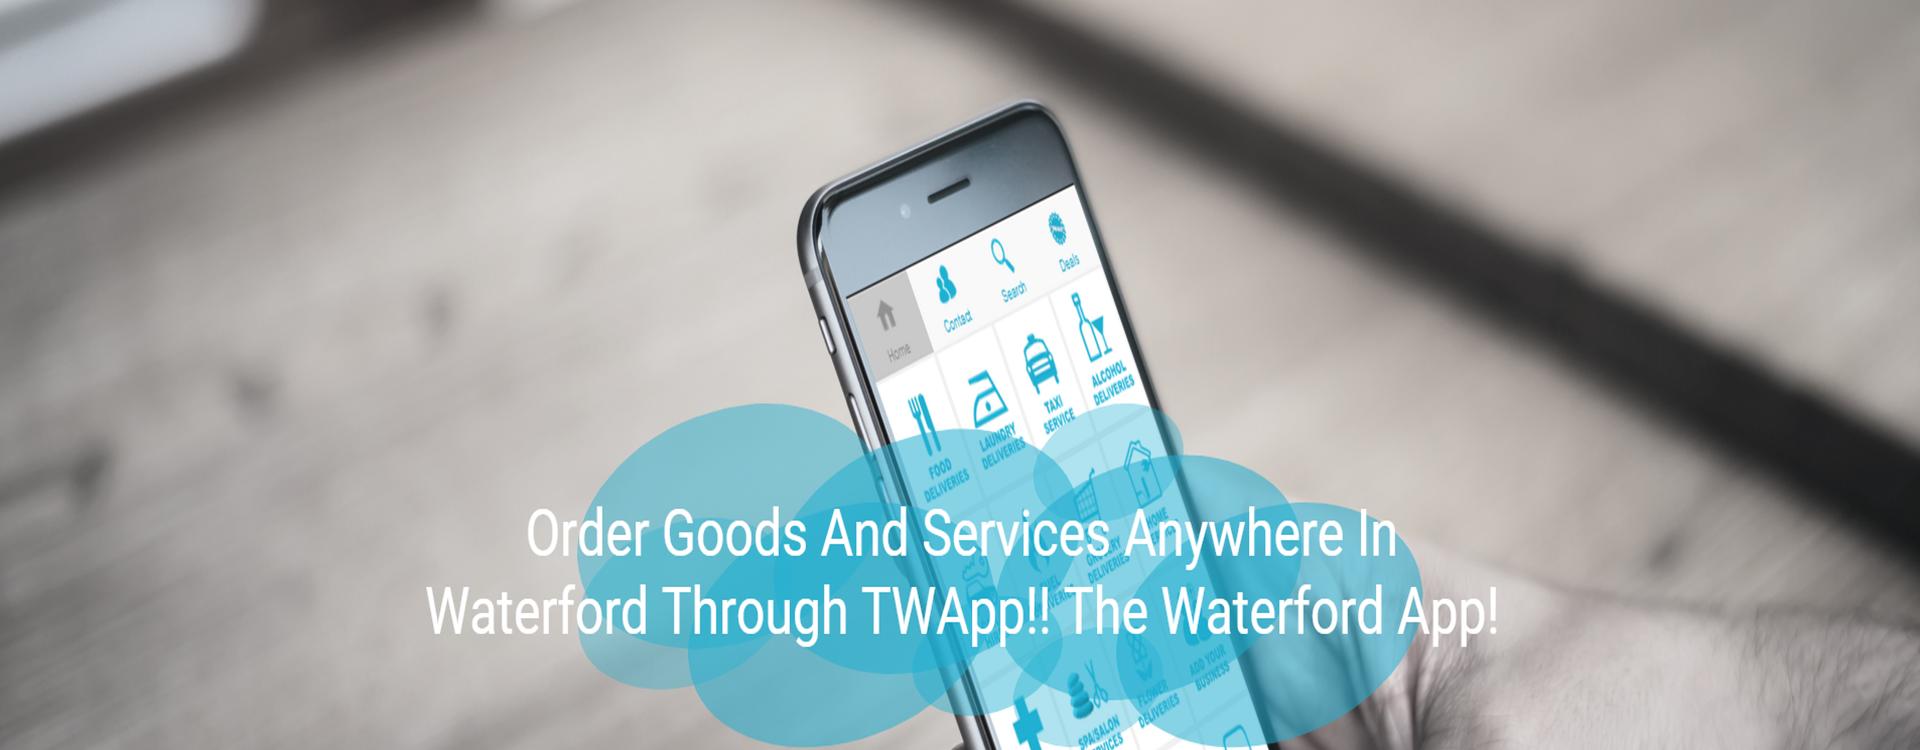 Twapp The Waterford App Twapp Media Web Design